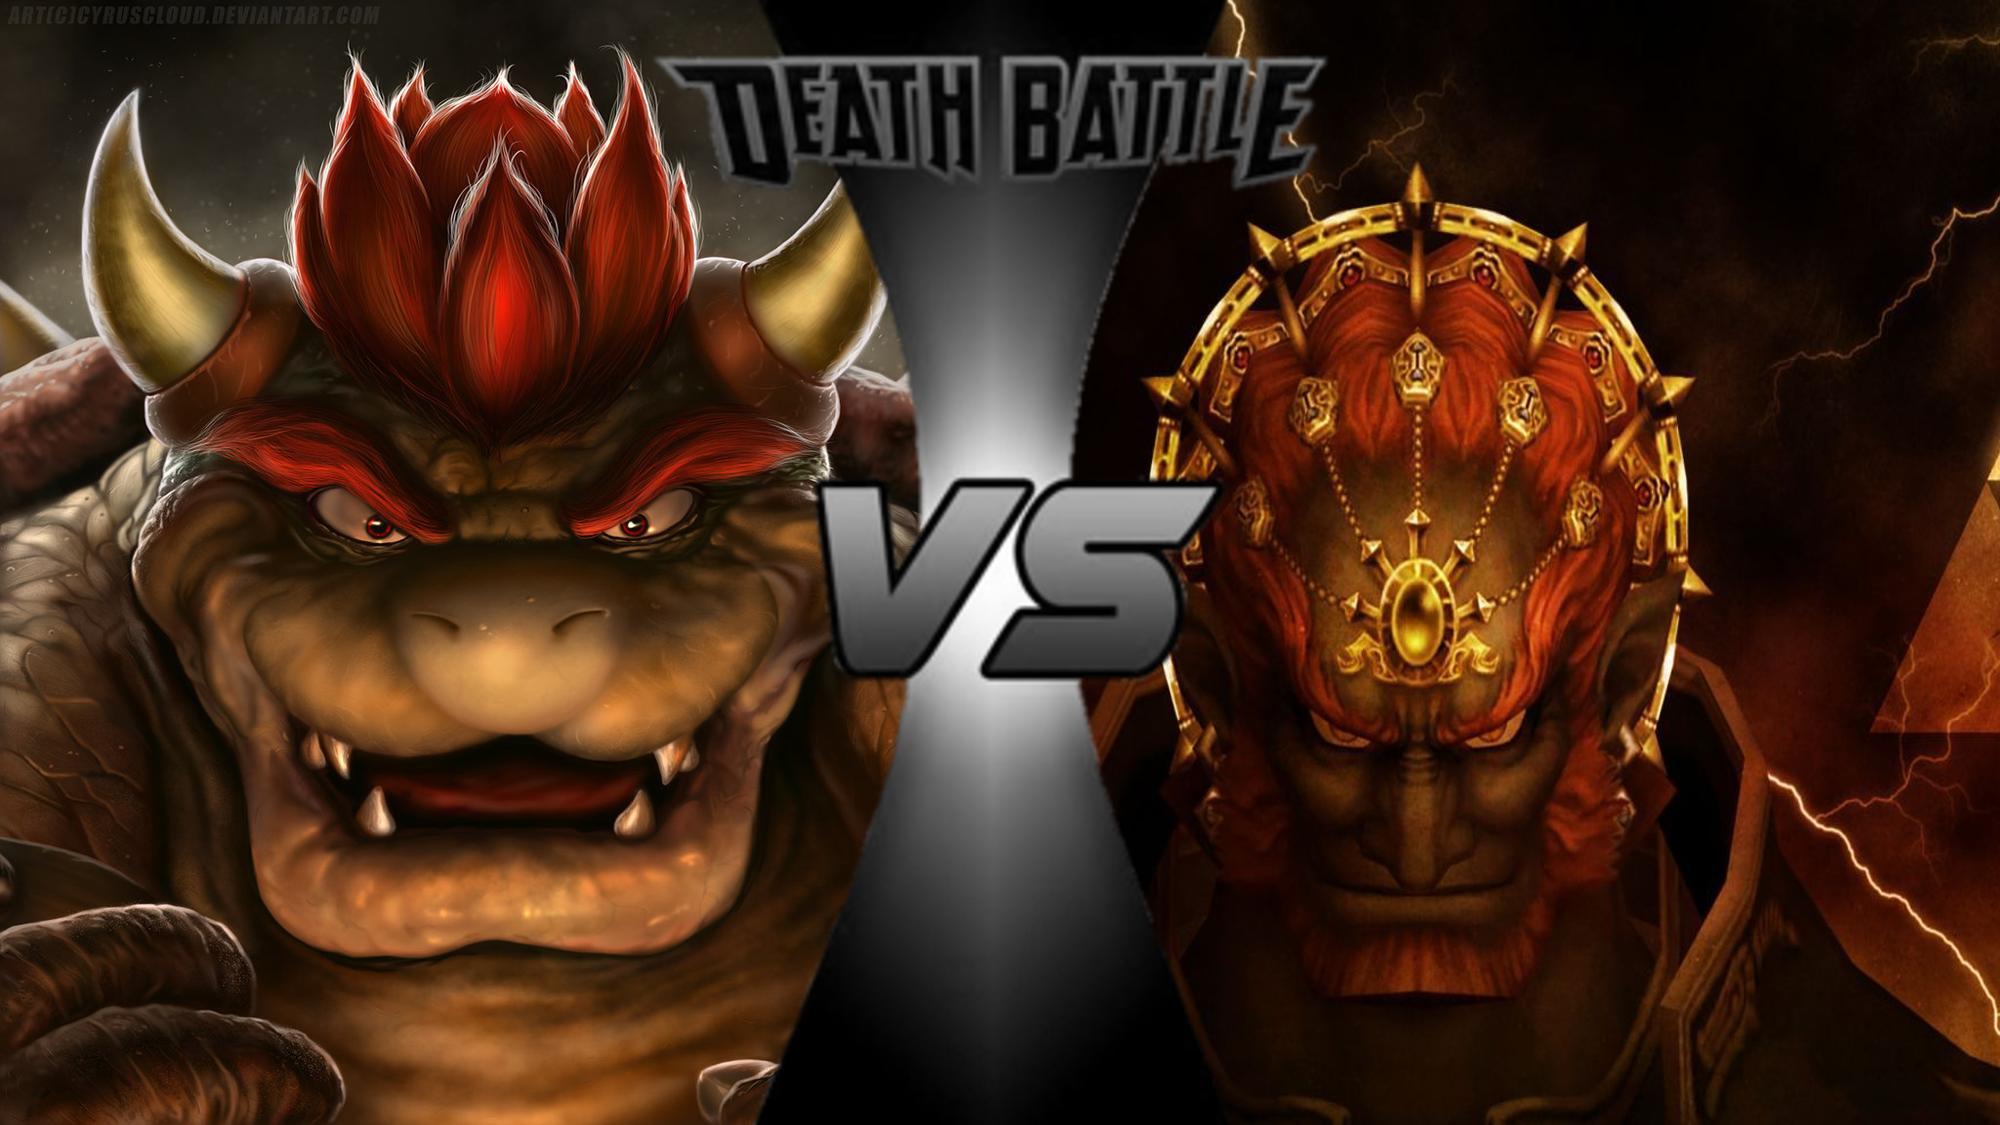 User blog:Paleomario66/Death Battle Blog: Bowser VS Ganondorf